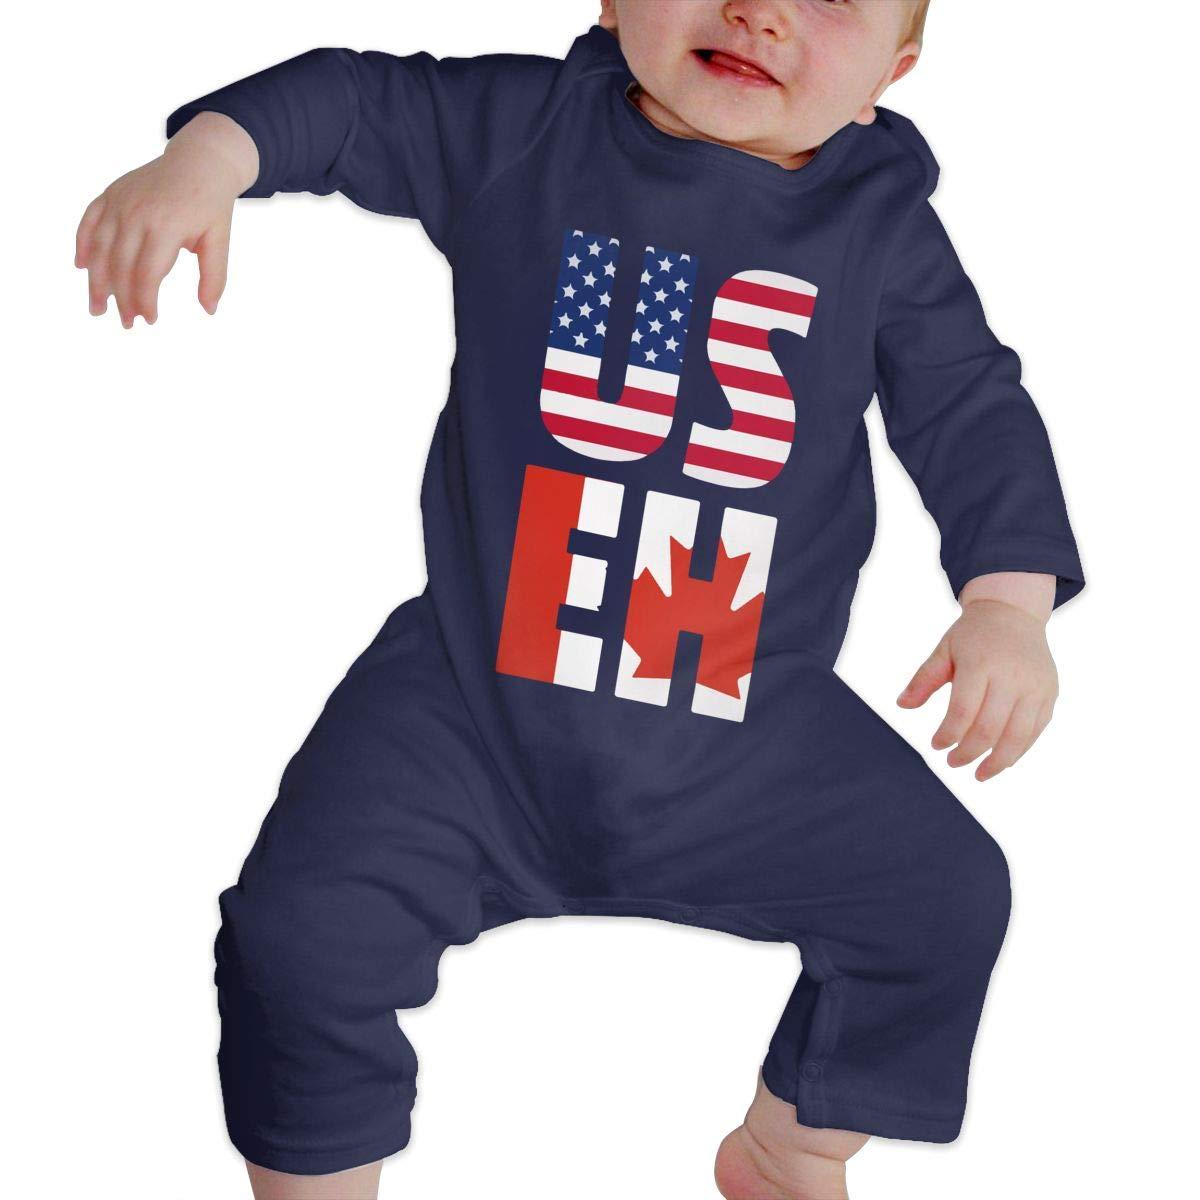 Warm America Canada Cotton Db84UR@5p Infant Baby Girls Boys Long Sleeve Bodysuit